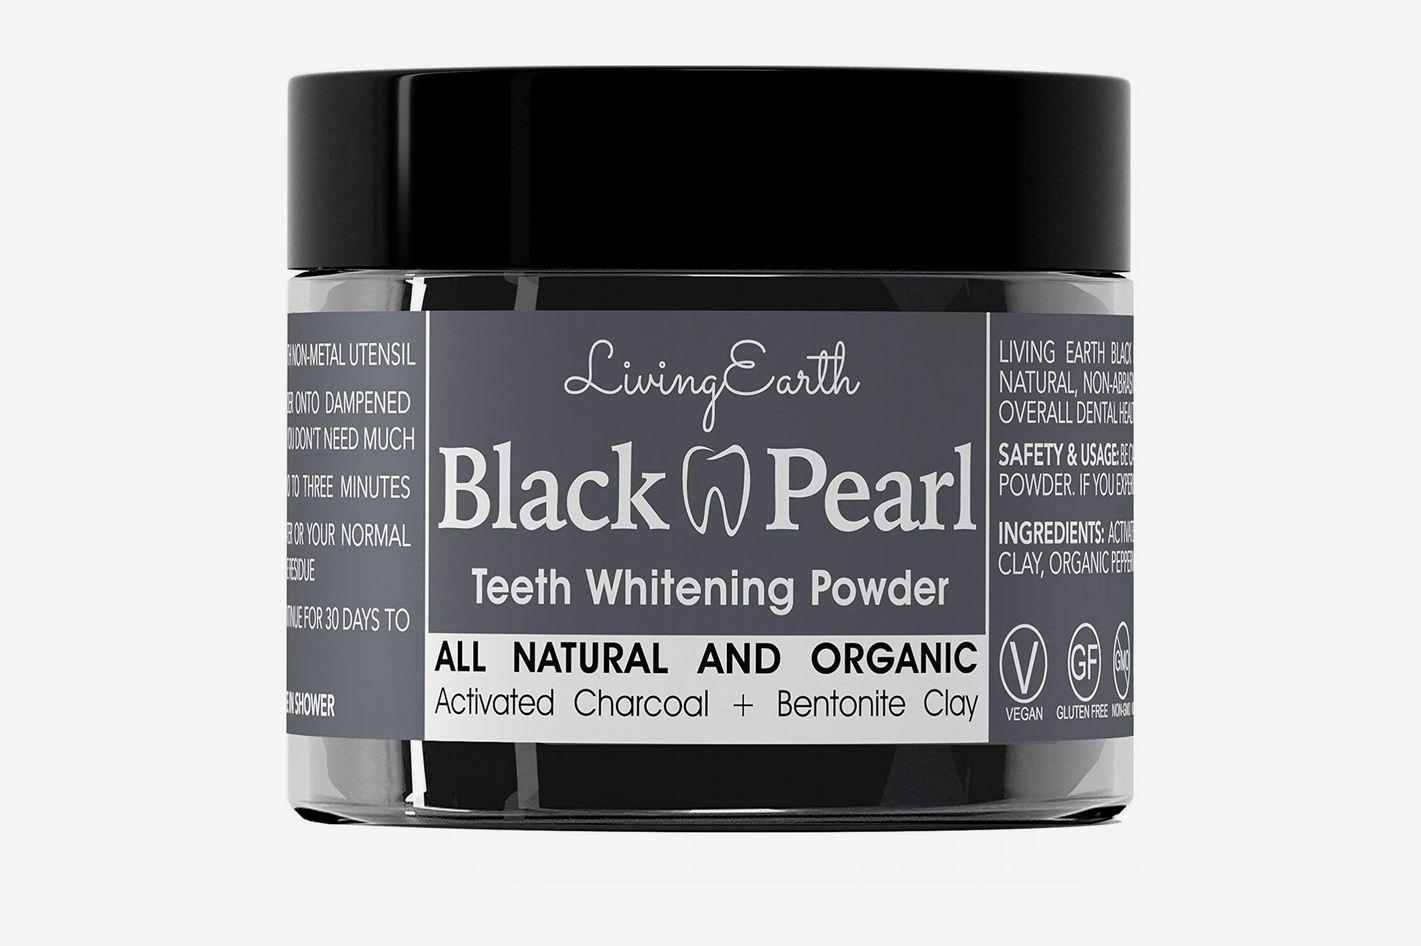 Living Earth Black Pearl Teeth Whitening Powder